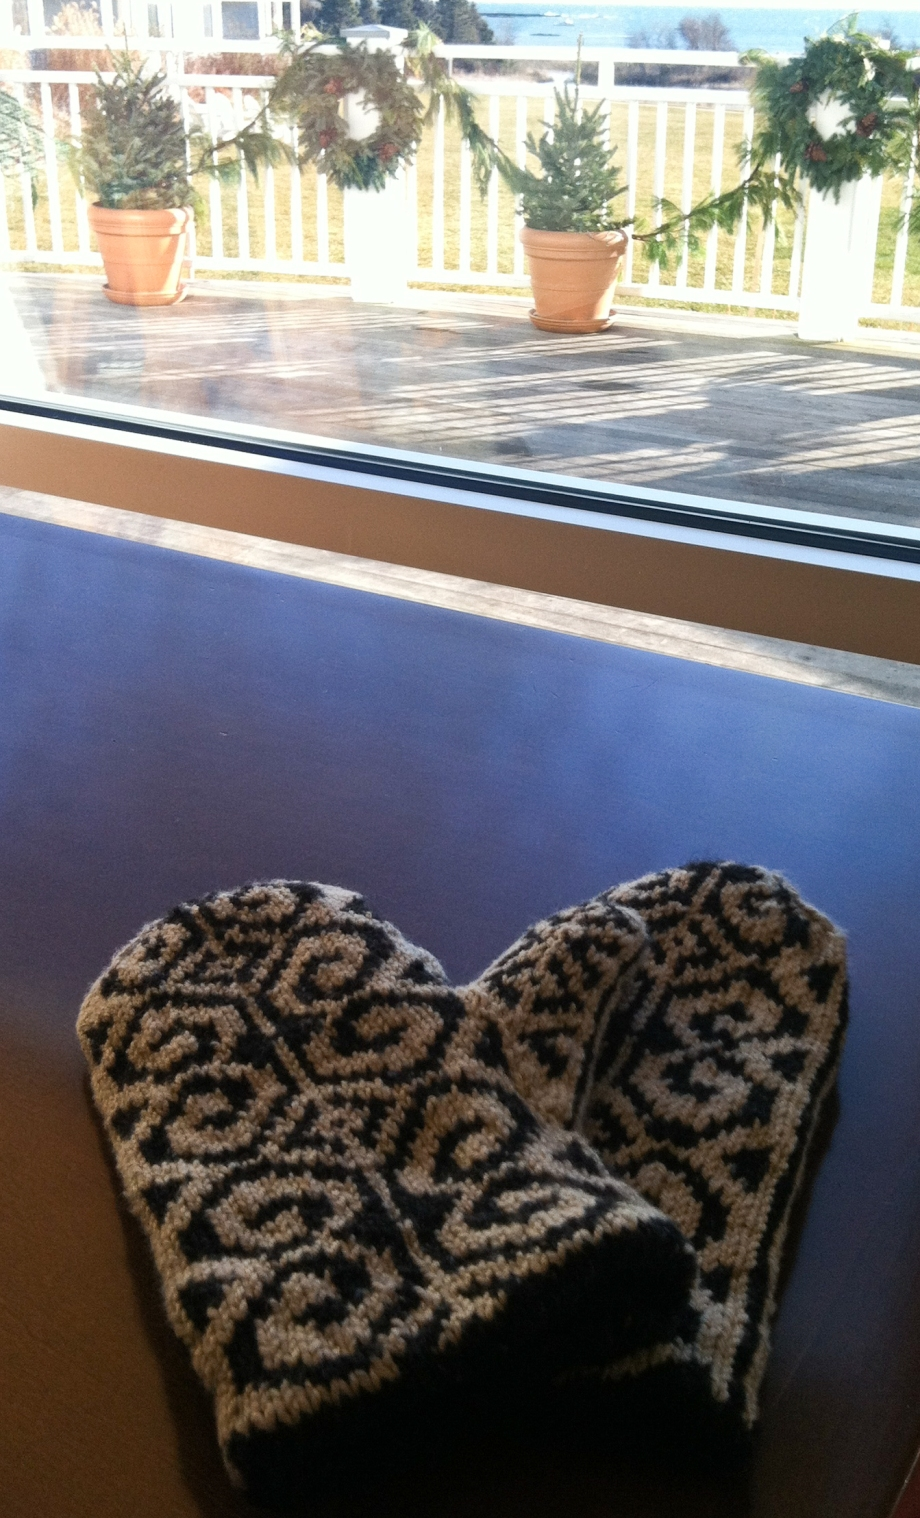 warmest mittens ever!